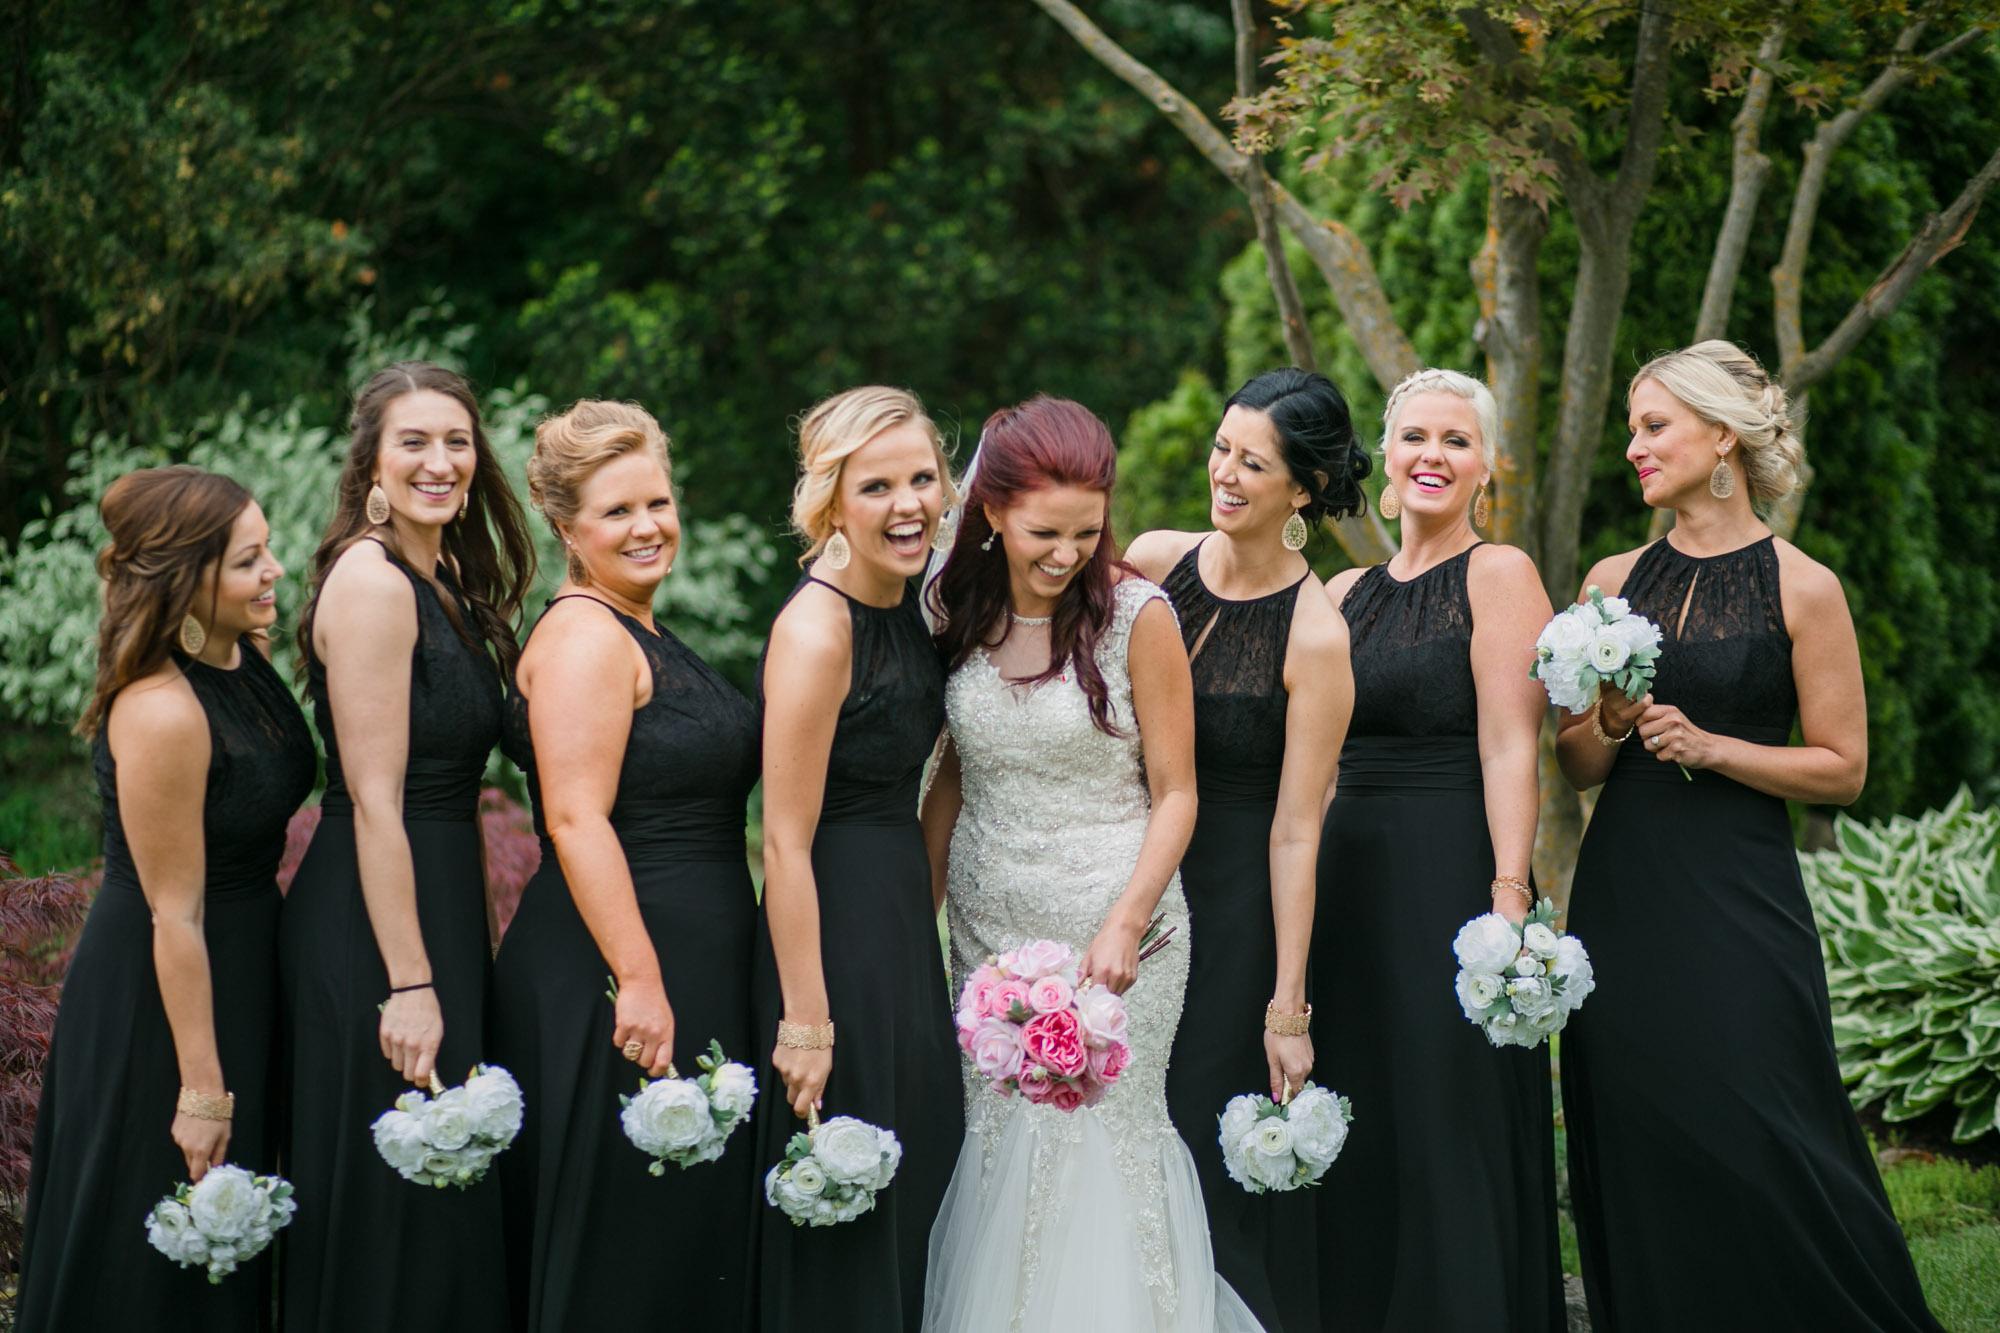 hensville-armory-wedding (5 of 8).jpg